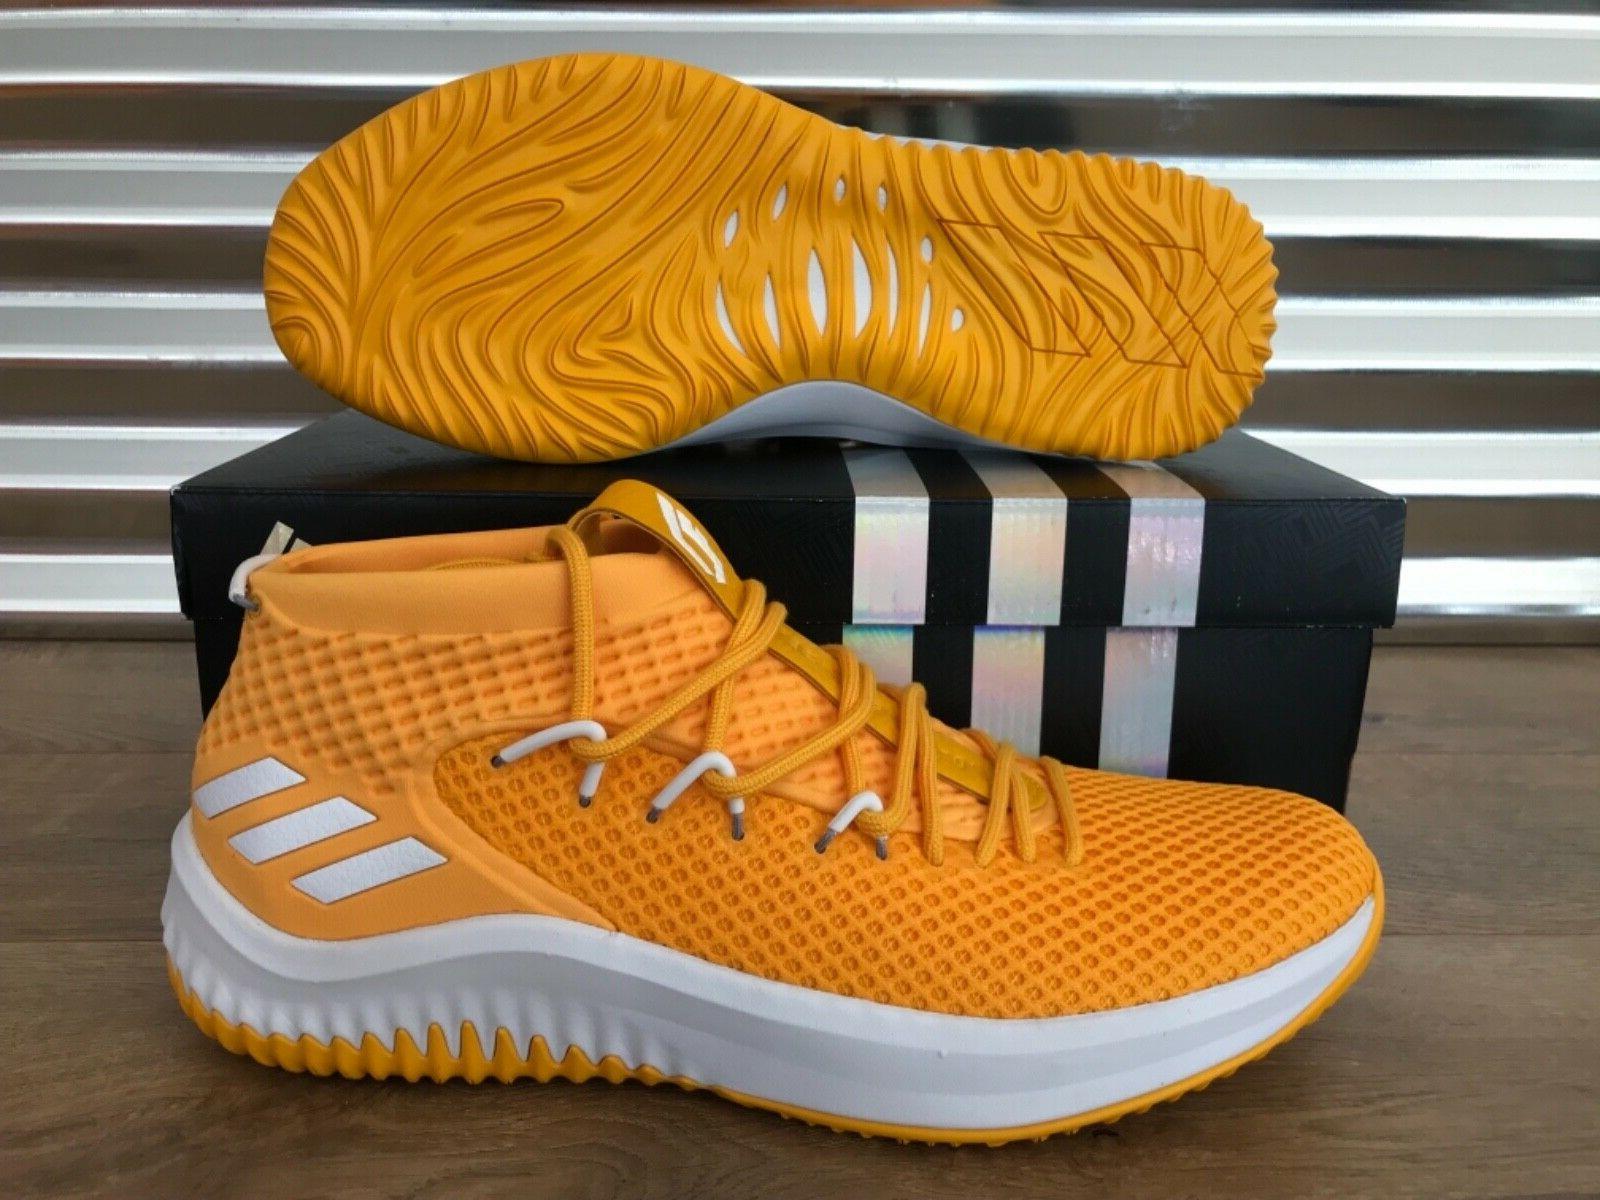 sm dame 4 nba basketball shoes yellow